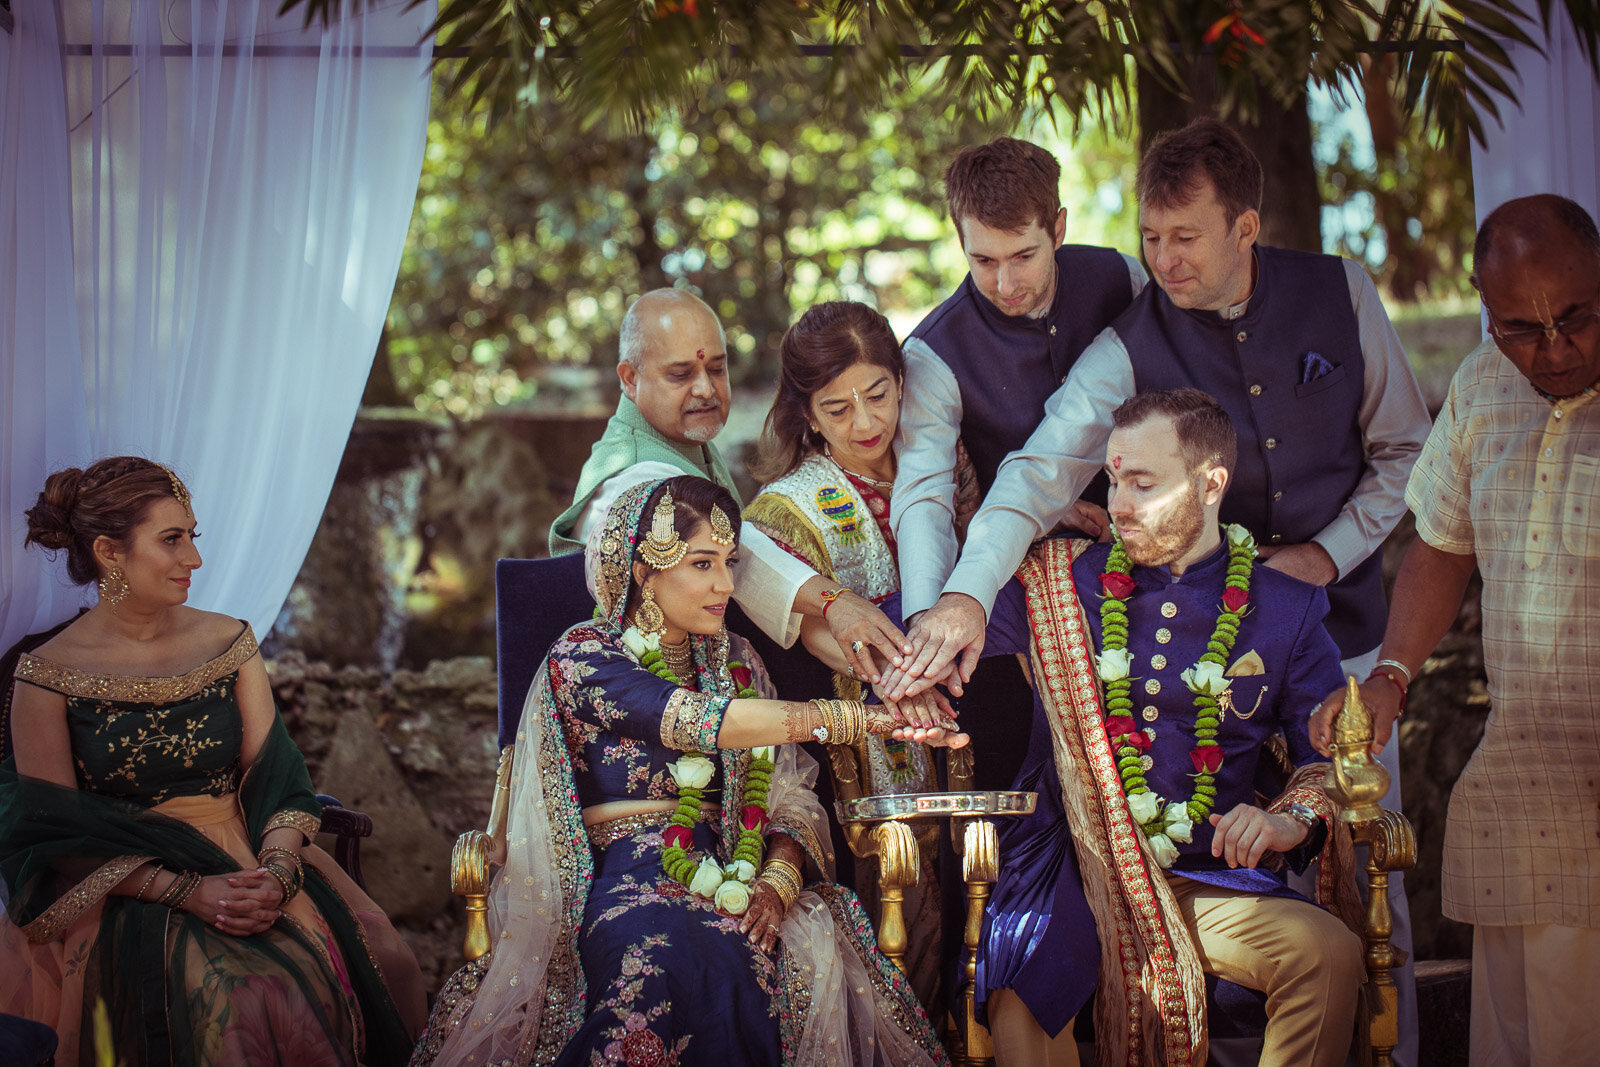 Destination Indian Wedding in Borgo San Faustino 17.jpg